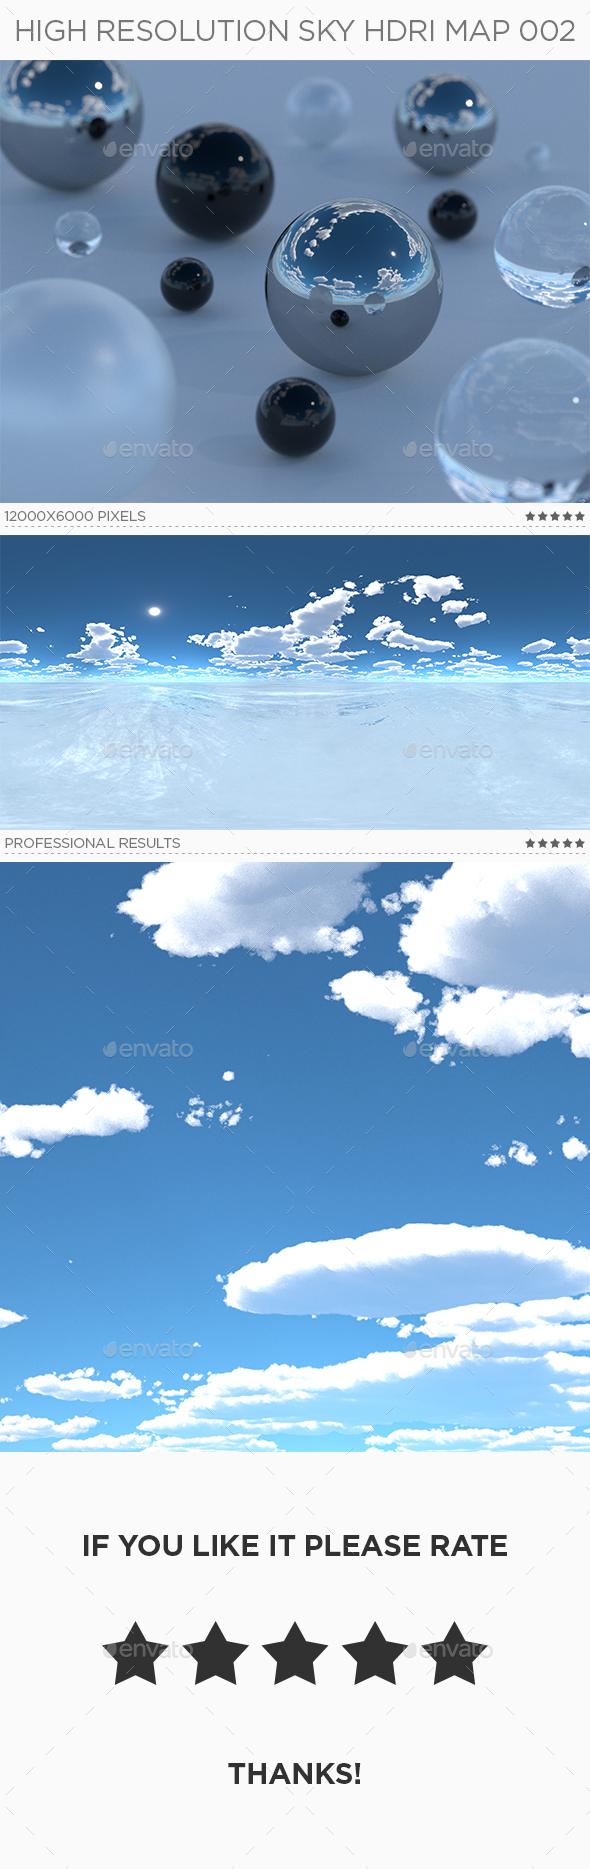 High Resolution Sky HDRi Map 002 - 3DOcean Item for Sale